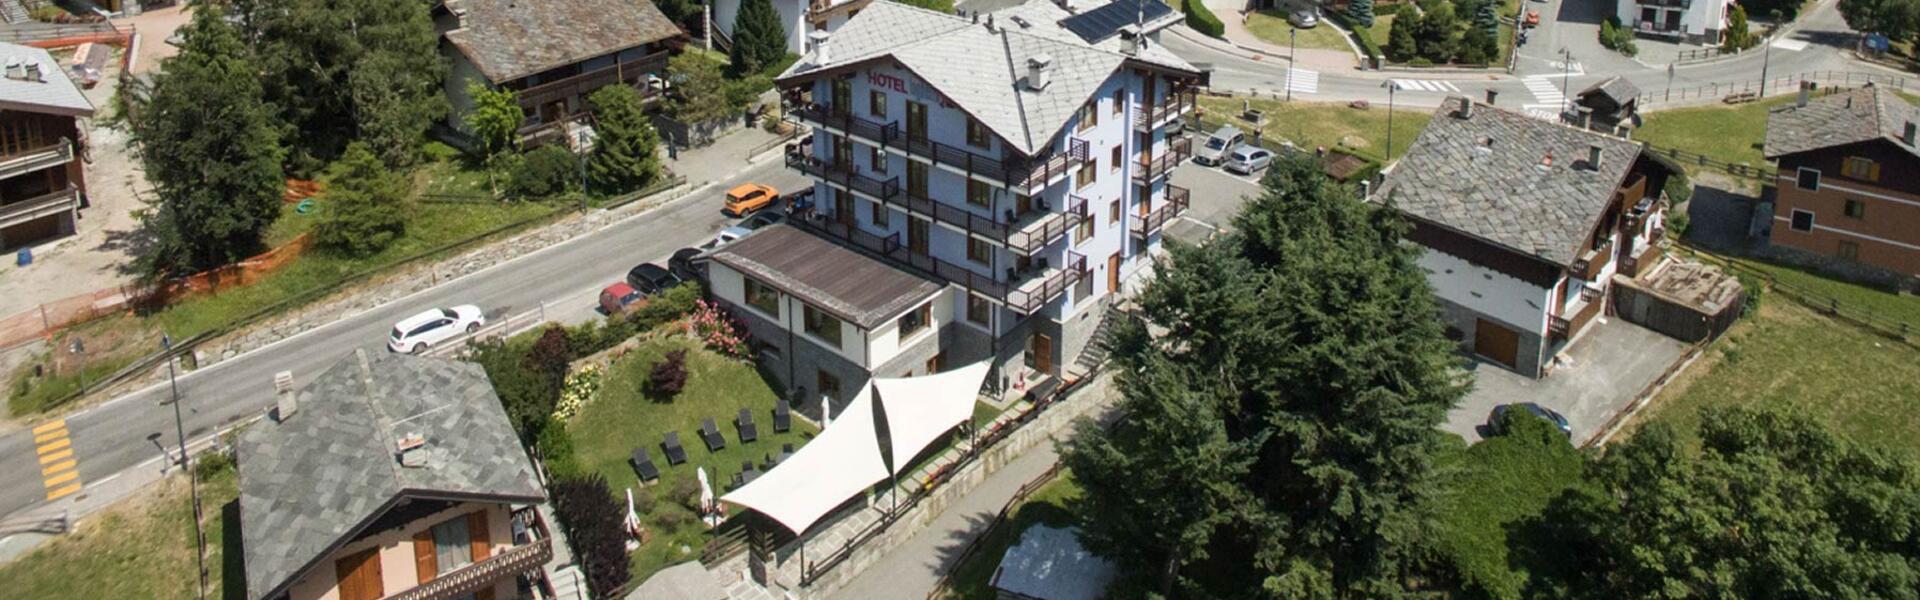 hotellaghetto en location 003